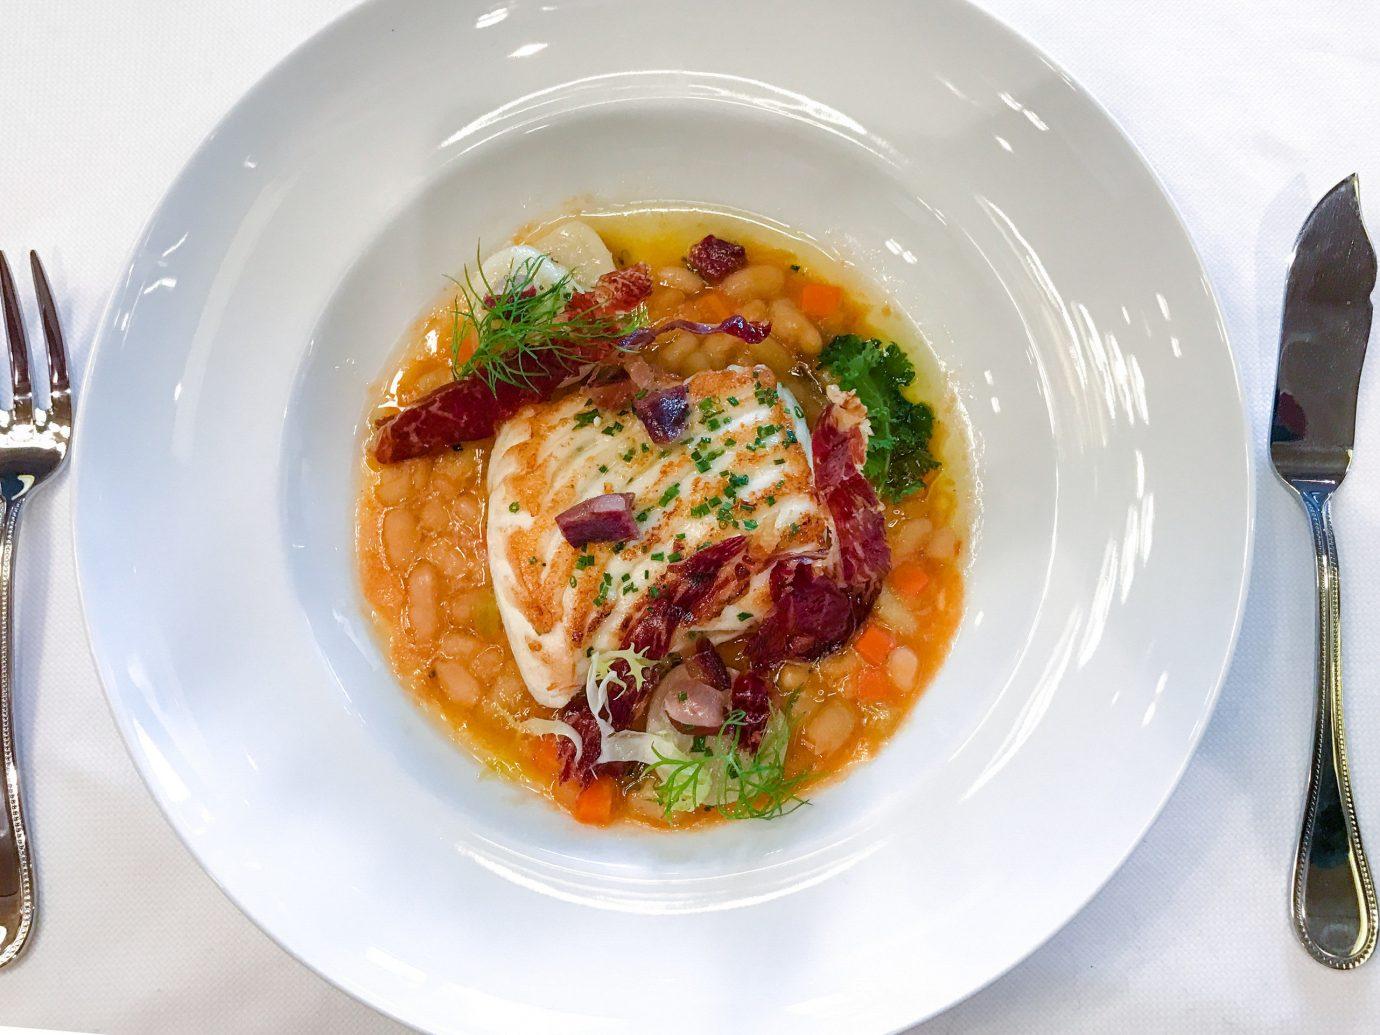 Trip Ideas Weekend Getaways plate food table dish white meal produce fish cuisine vegetable breakfast meat spaghetti piece de resistance